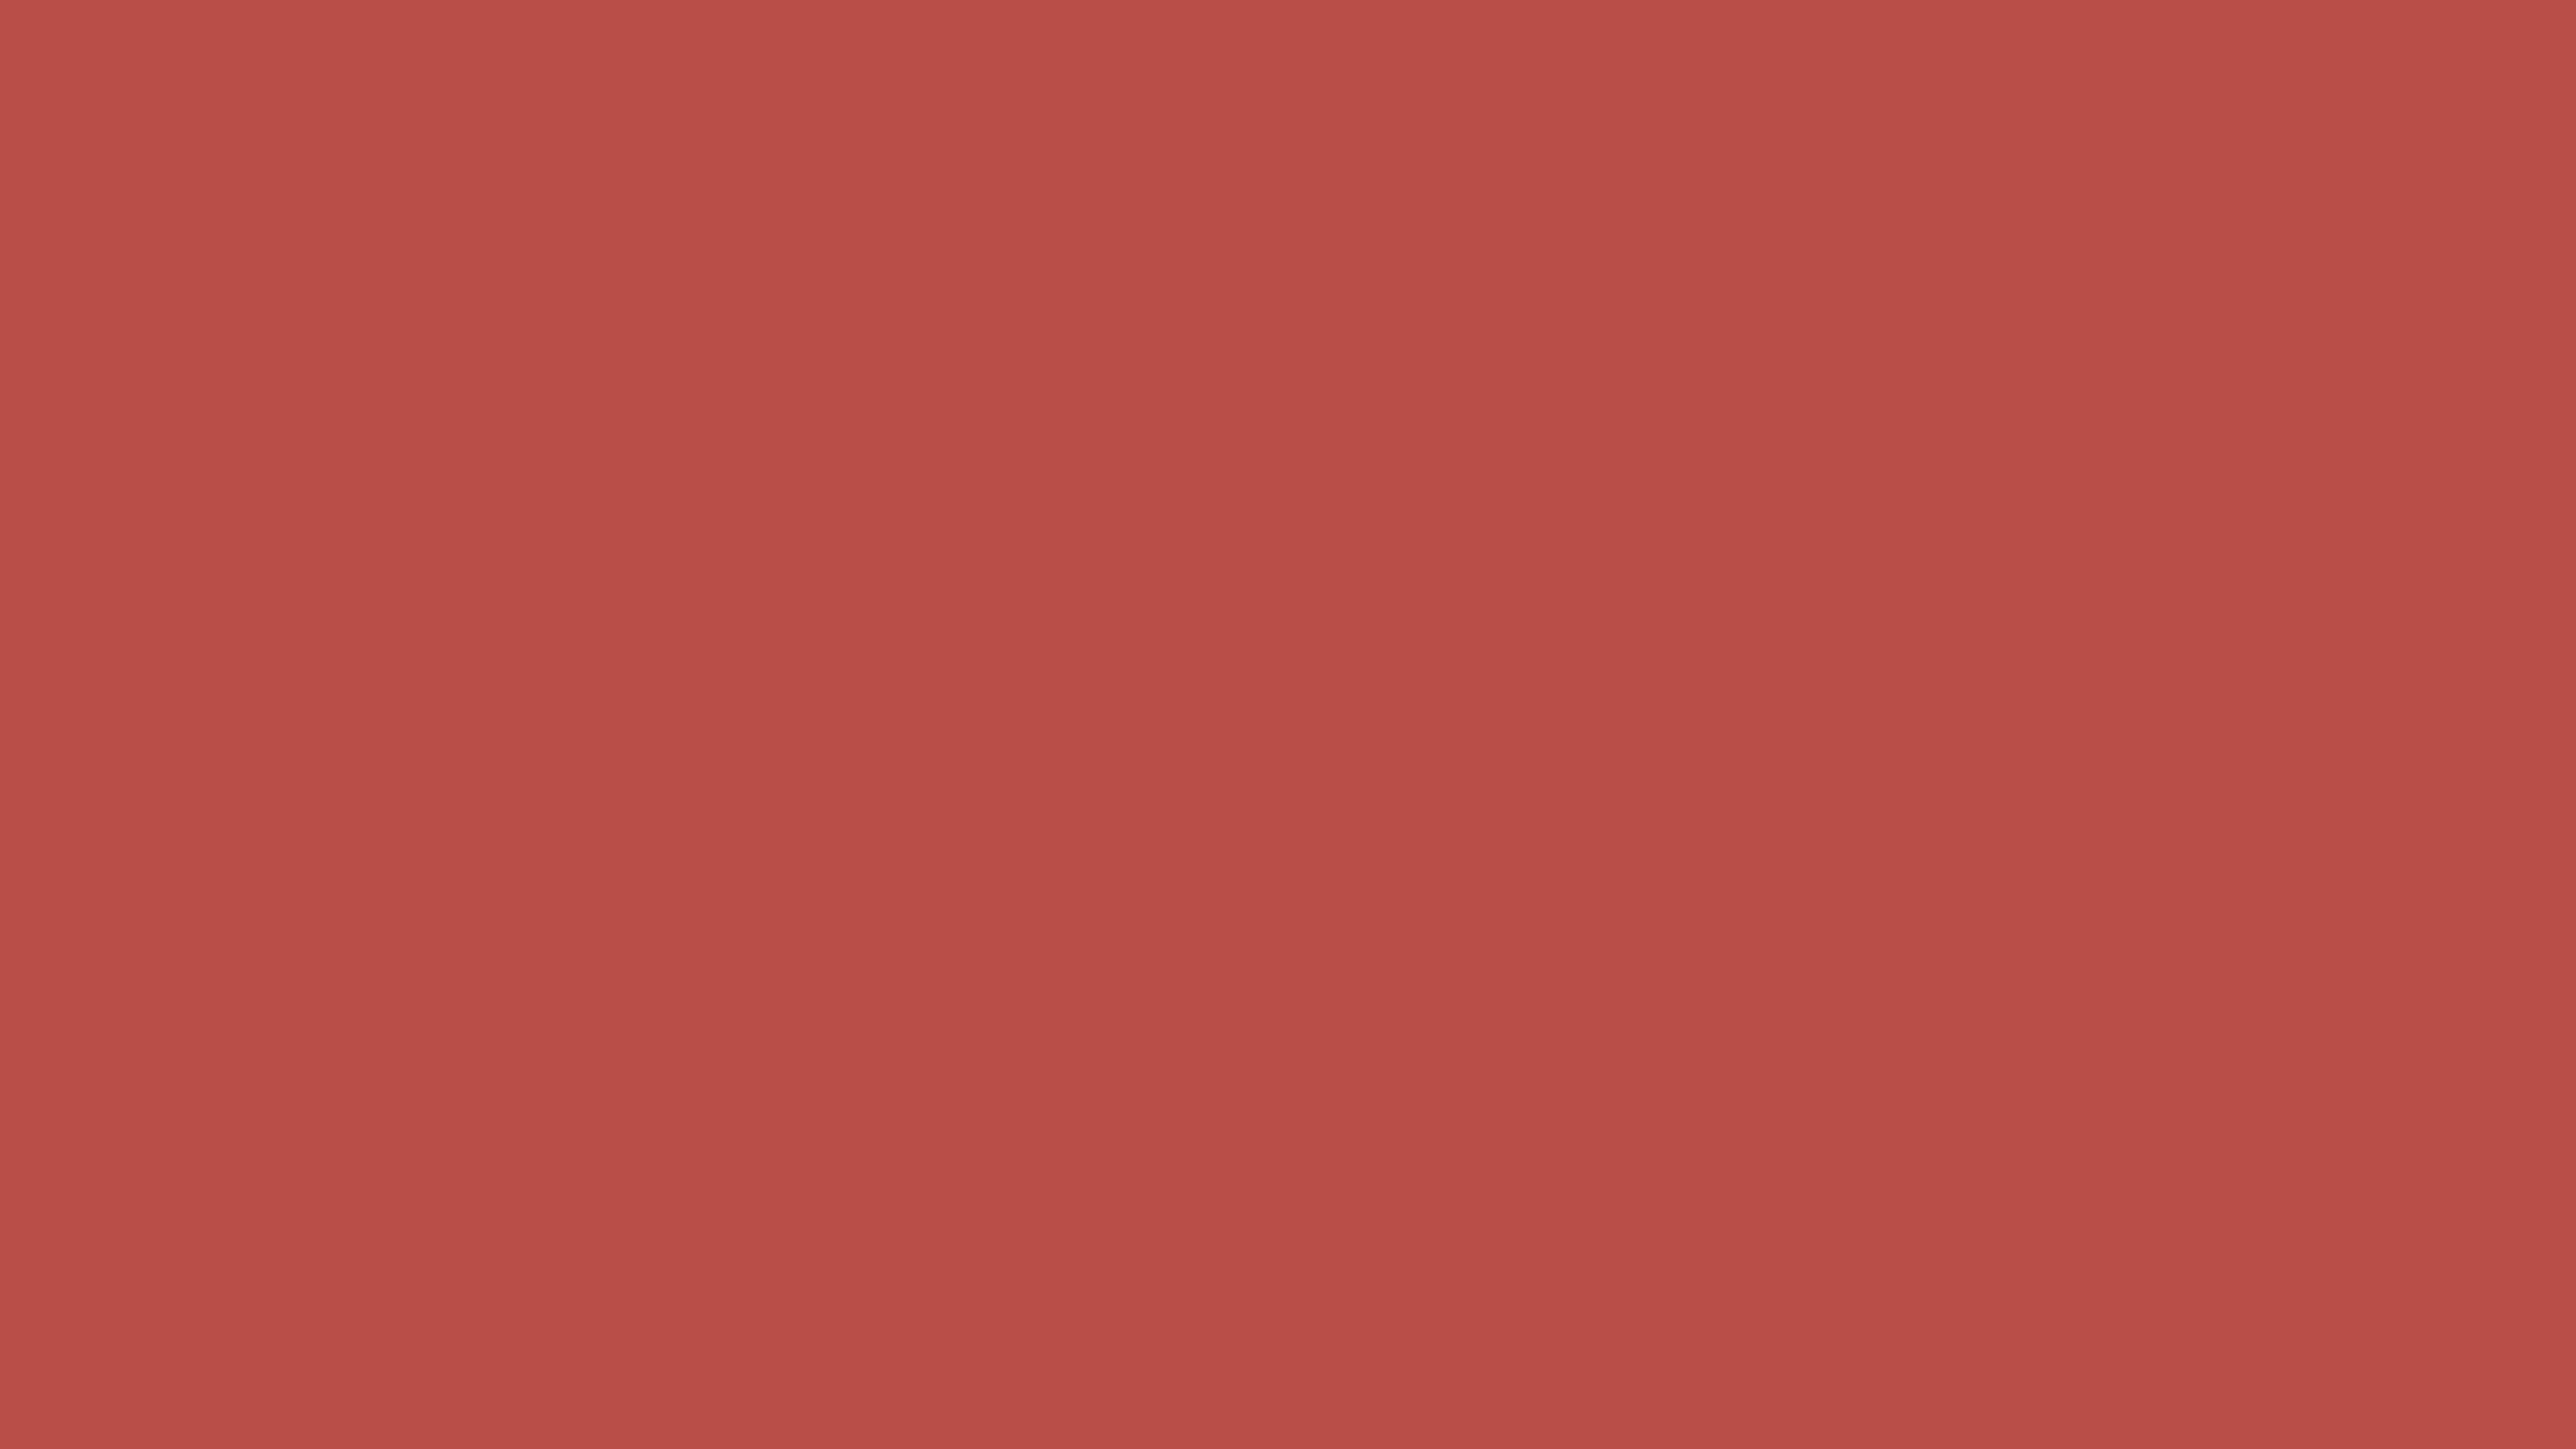 5120x2880 Deep Chestnut Solid Color Background